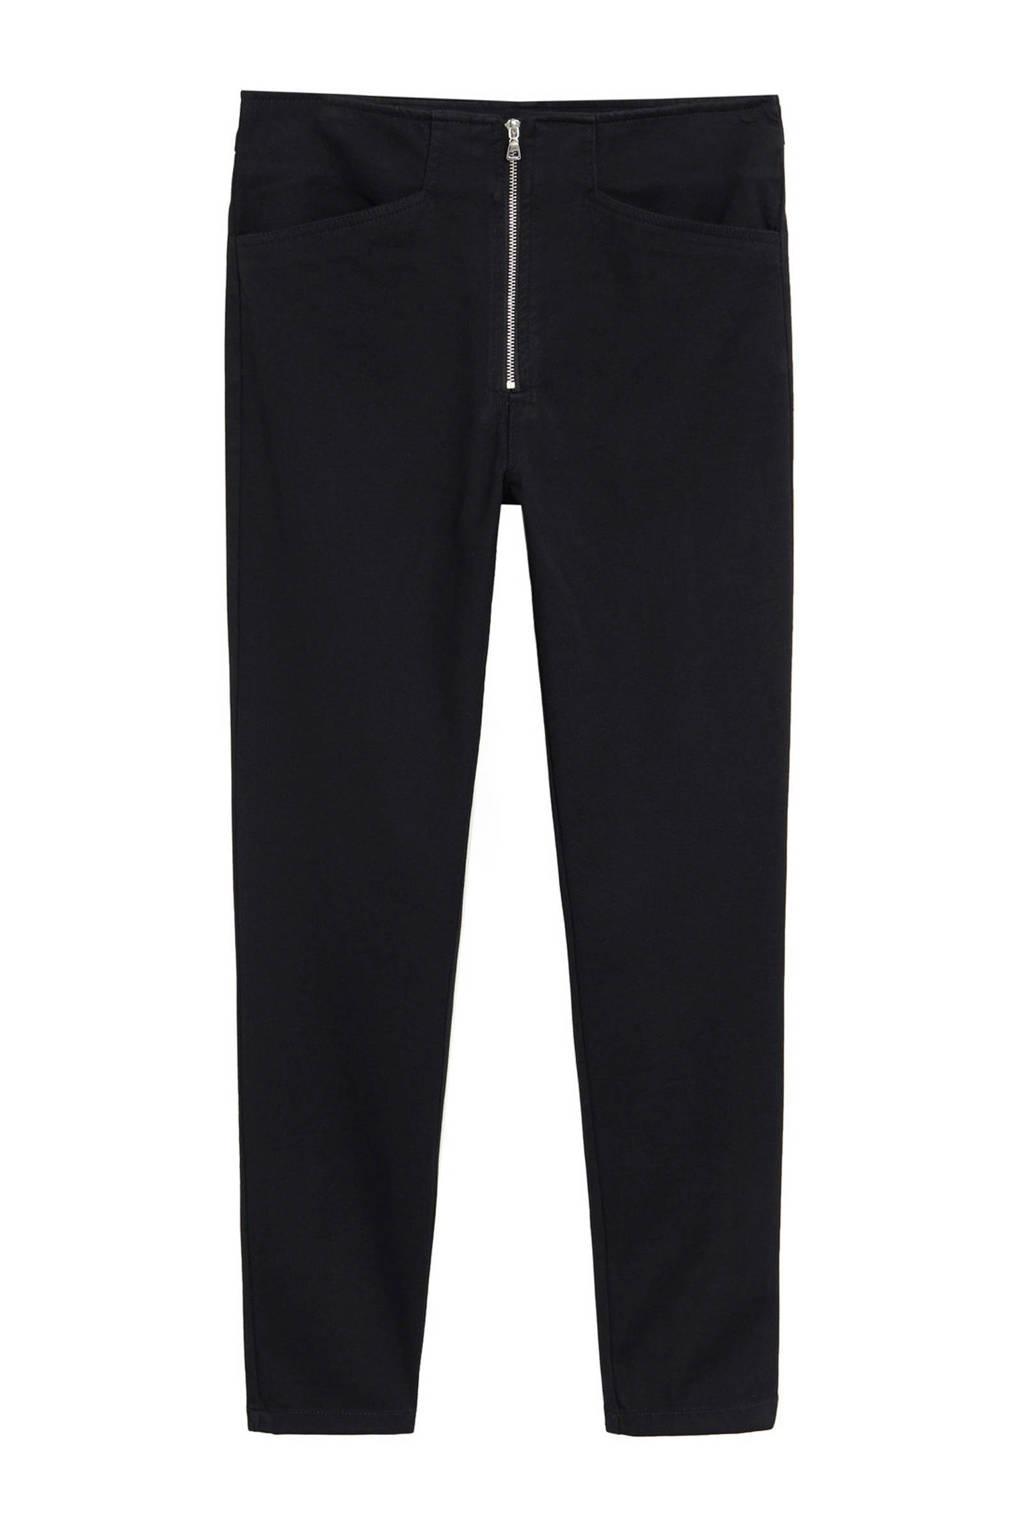 Mango cropped high waist skinny broek zwart, Zwart